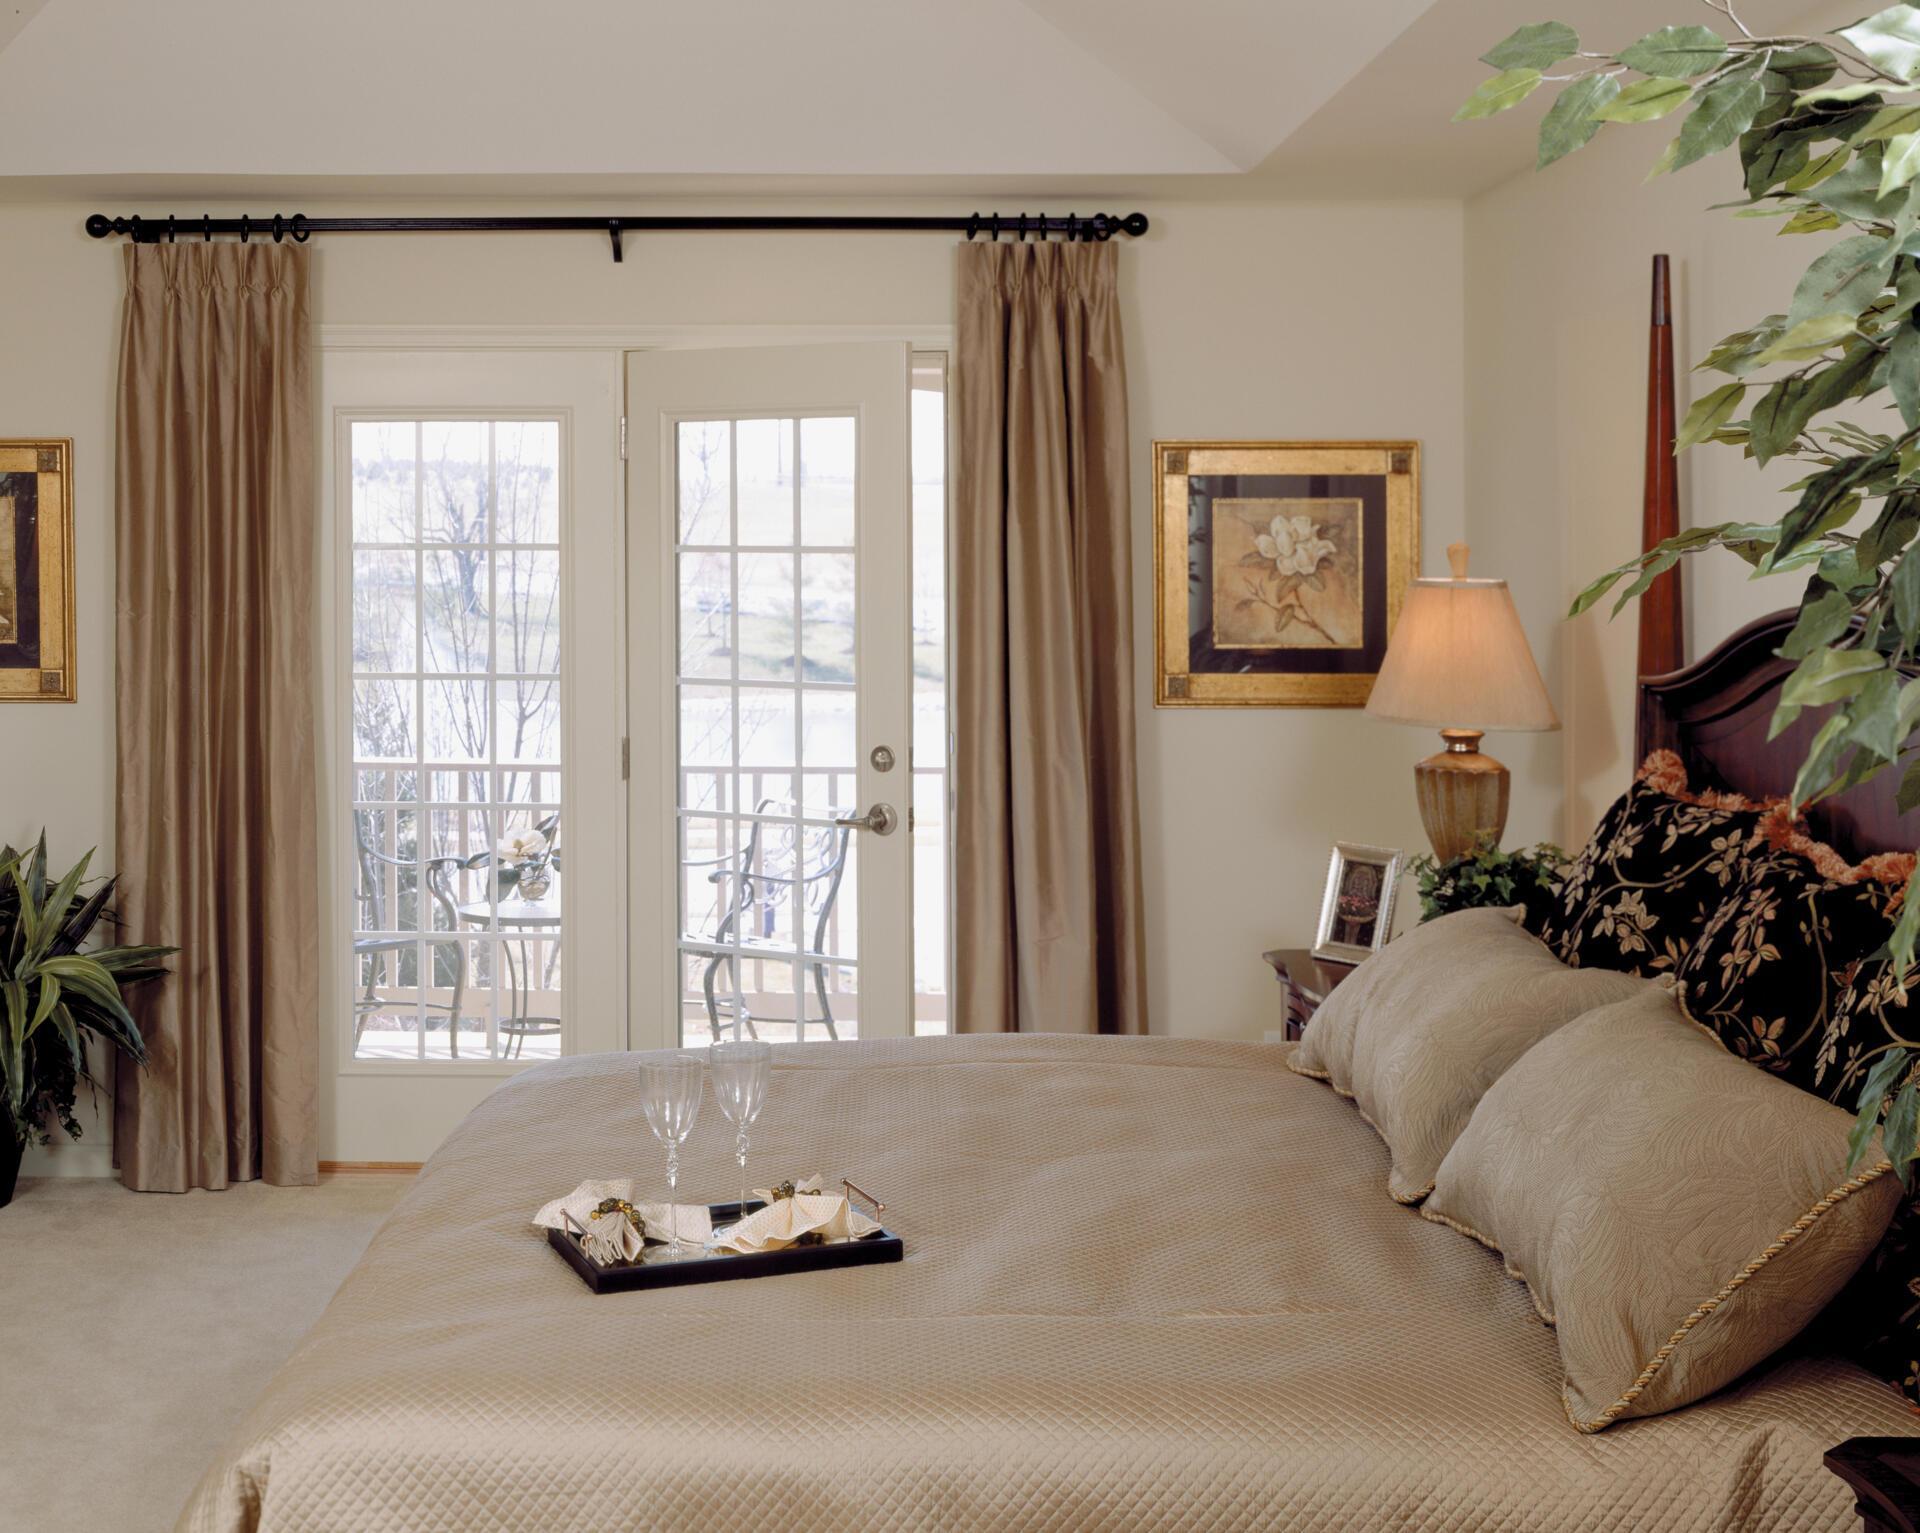 Bedroom featured in the Langdon By Drees Homes in Cincinnati, OH